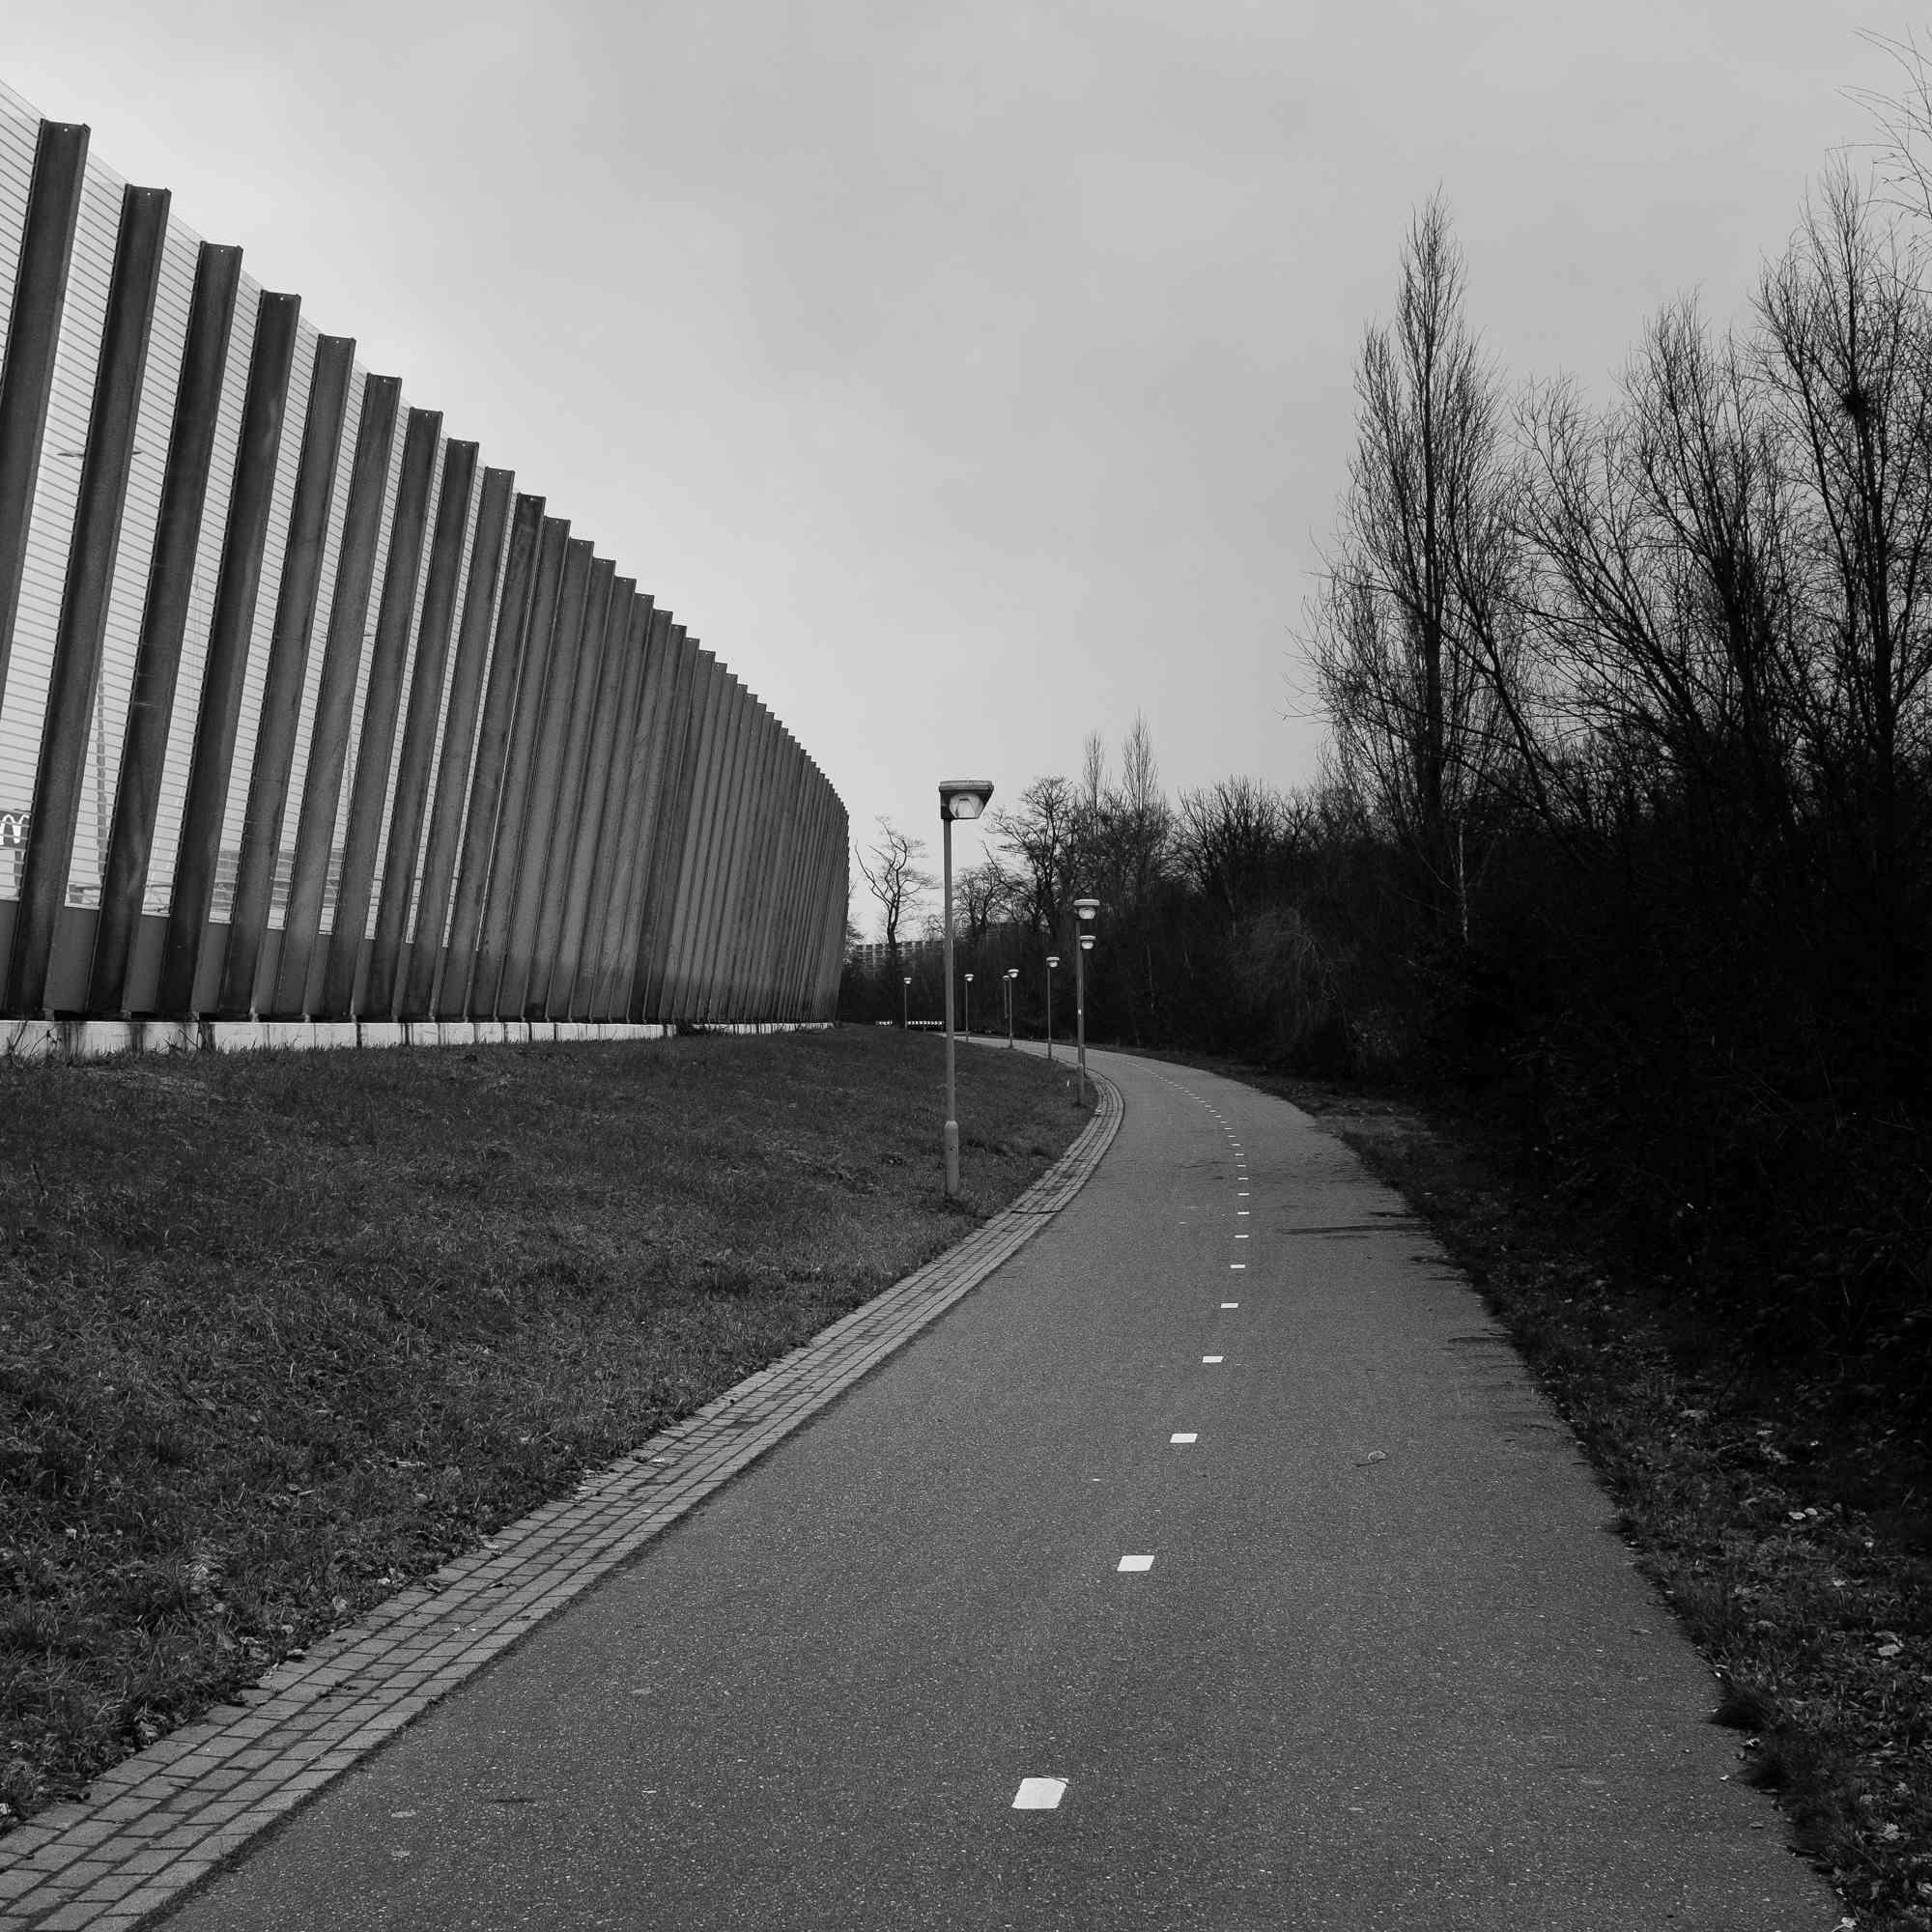 A bike road next to a freeway in Tegelen, NL